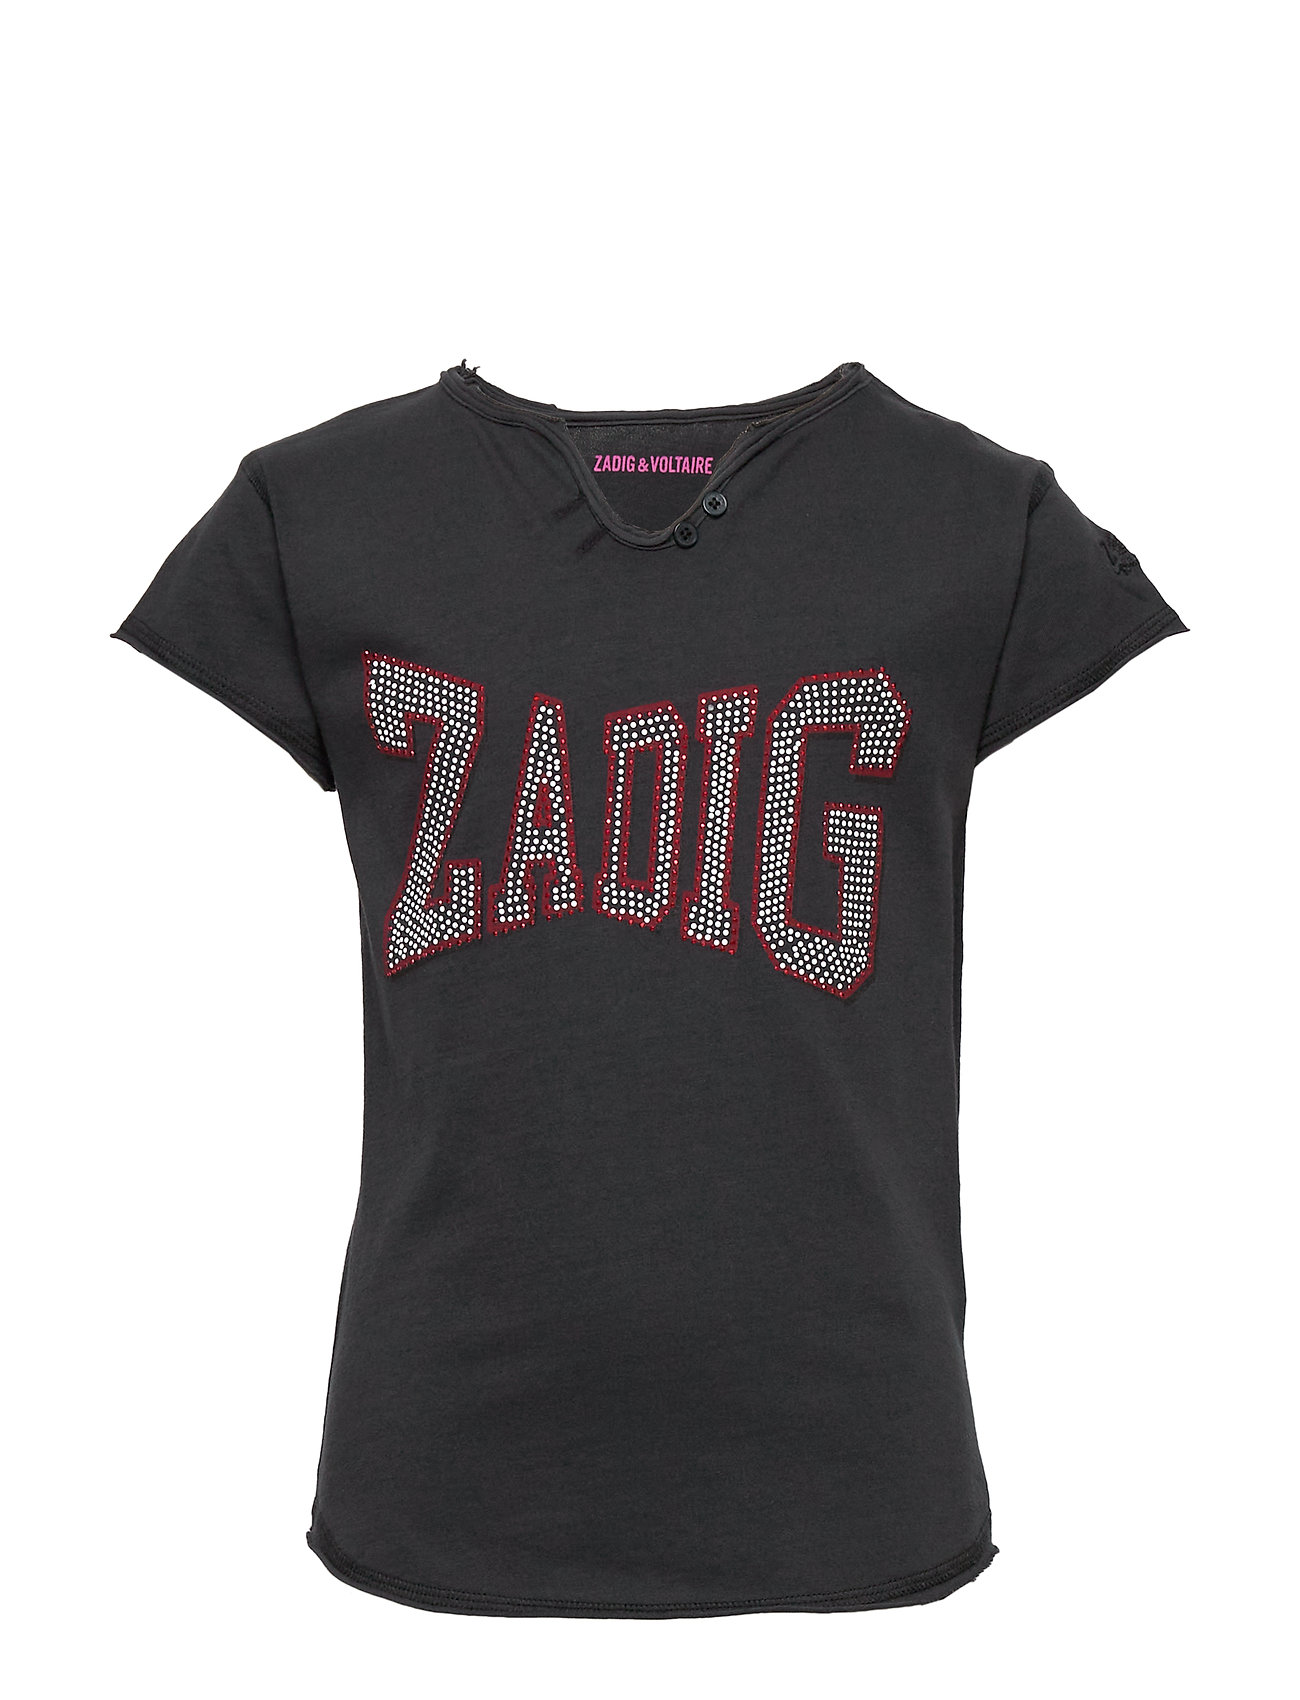 Zadig & Voltaire Kids SHORT SLEEVES TEE-SHIRT - CHARCOAL GREY